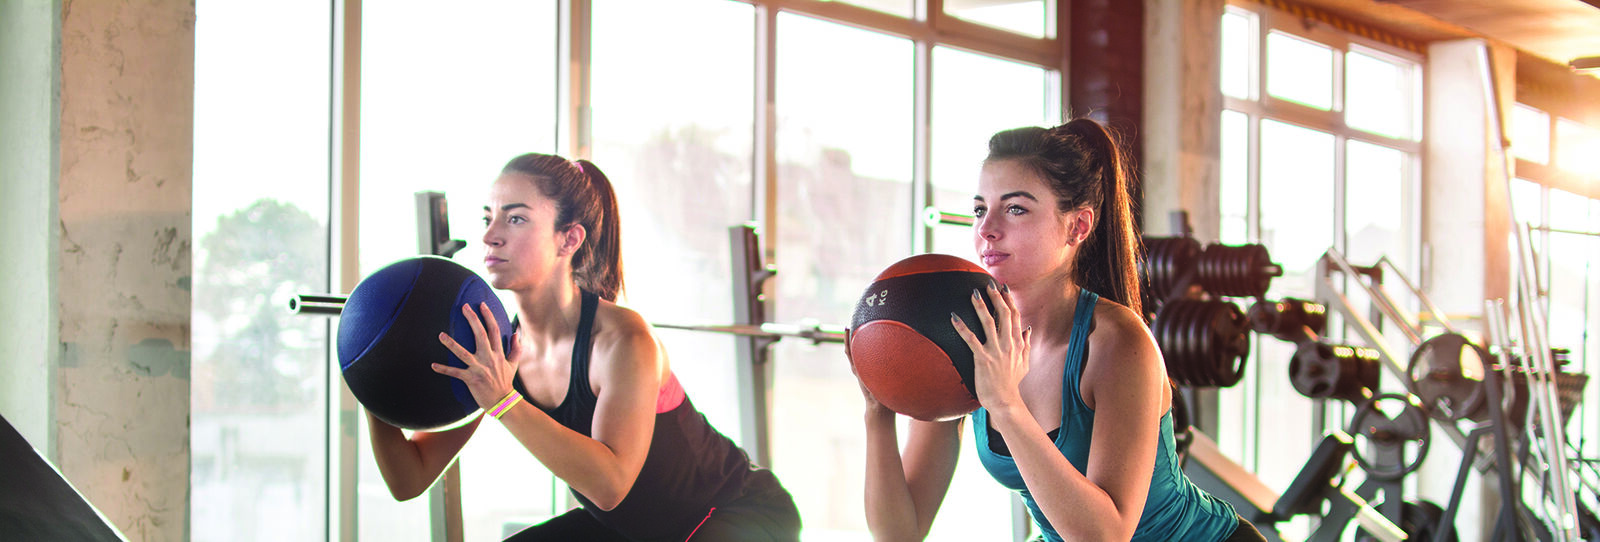 Blueair  Air quality at the gym  gym-banner